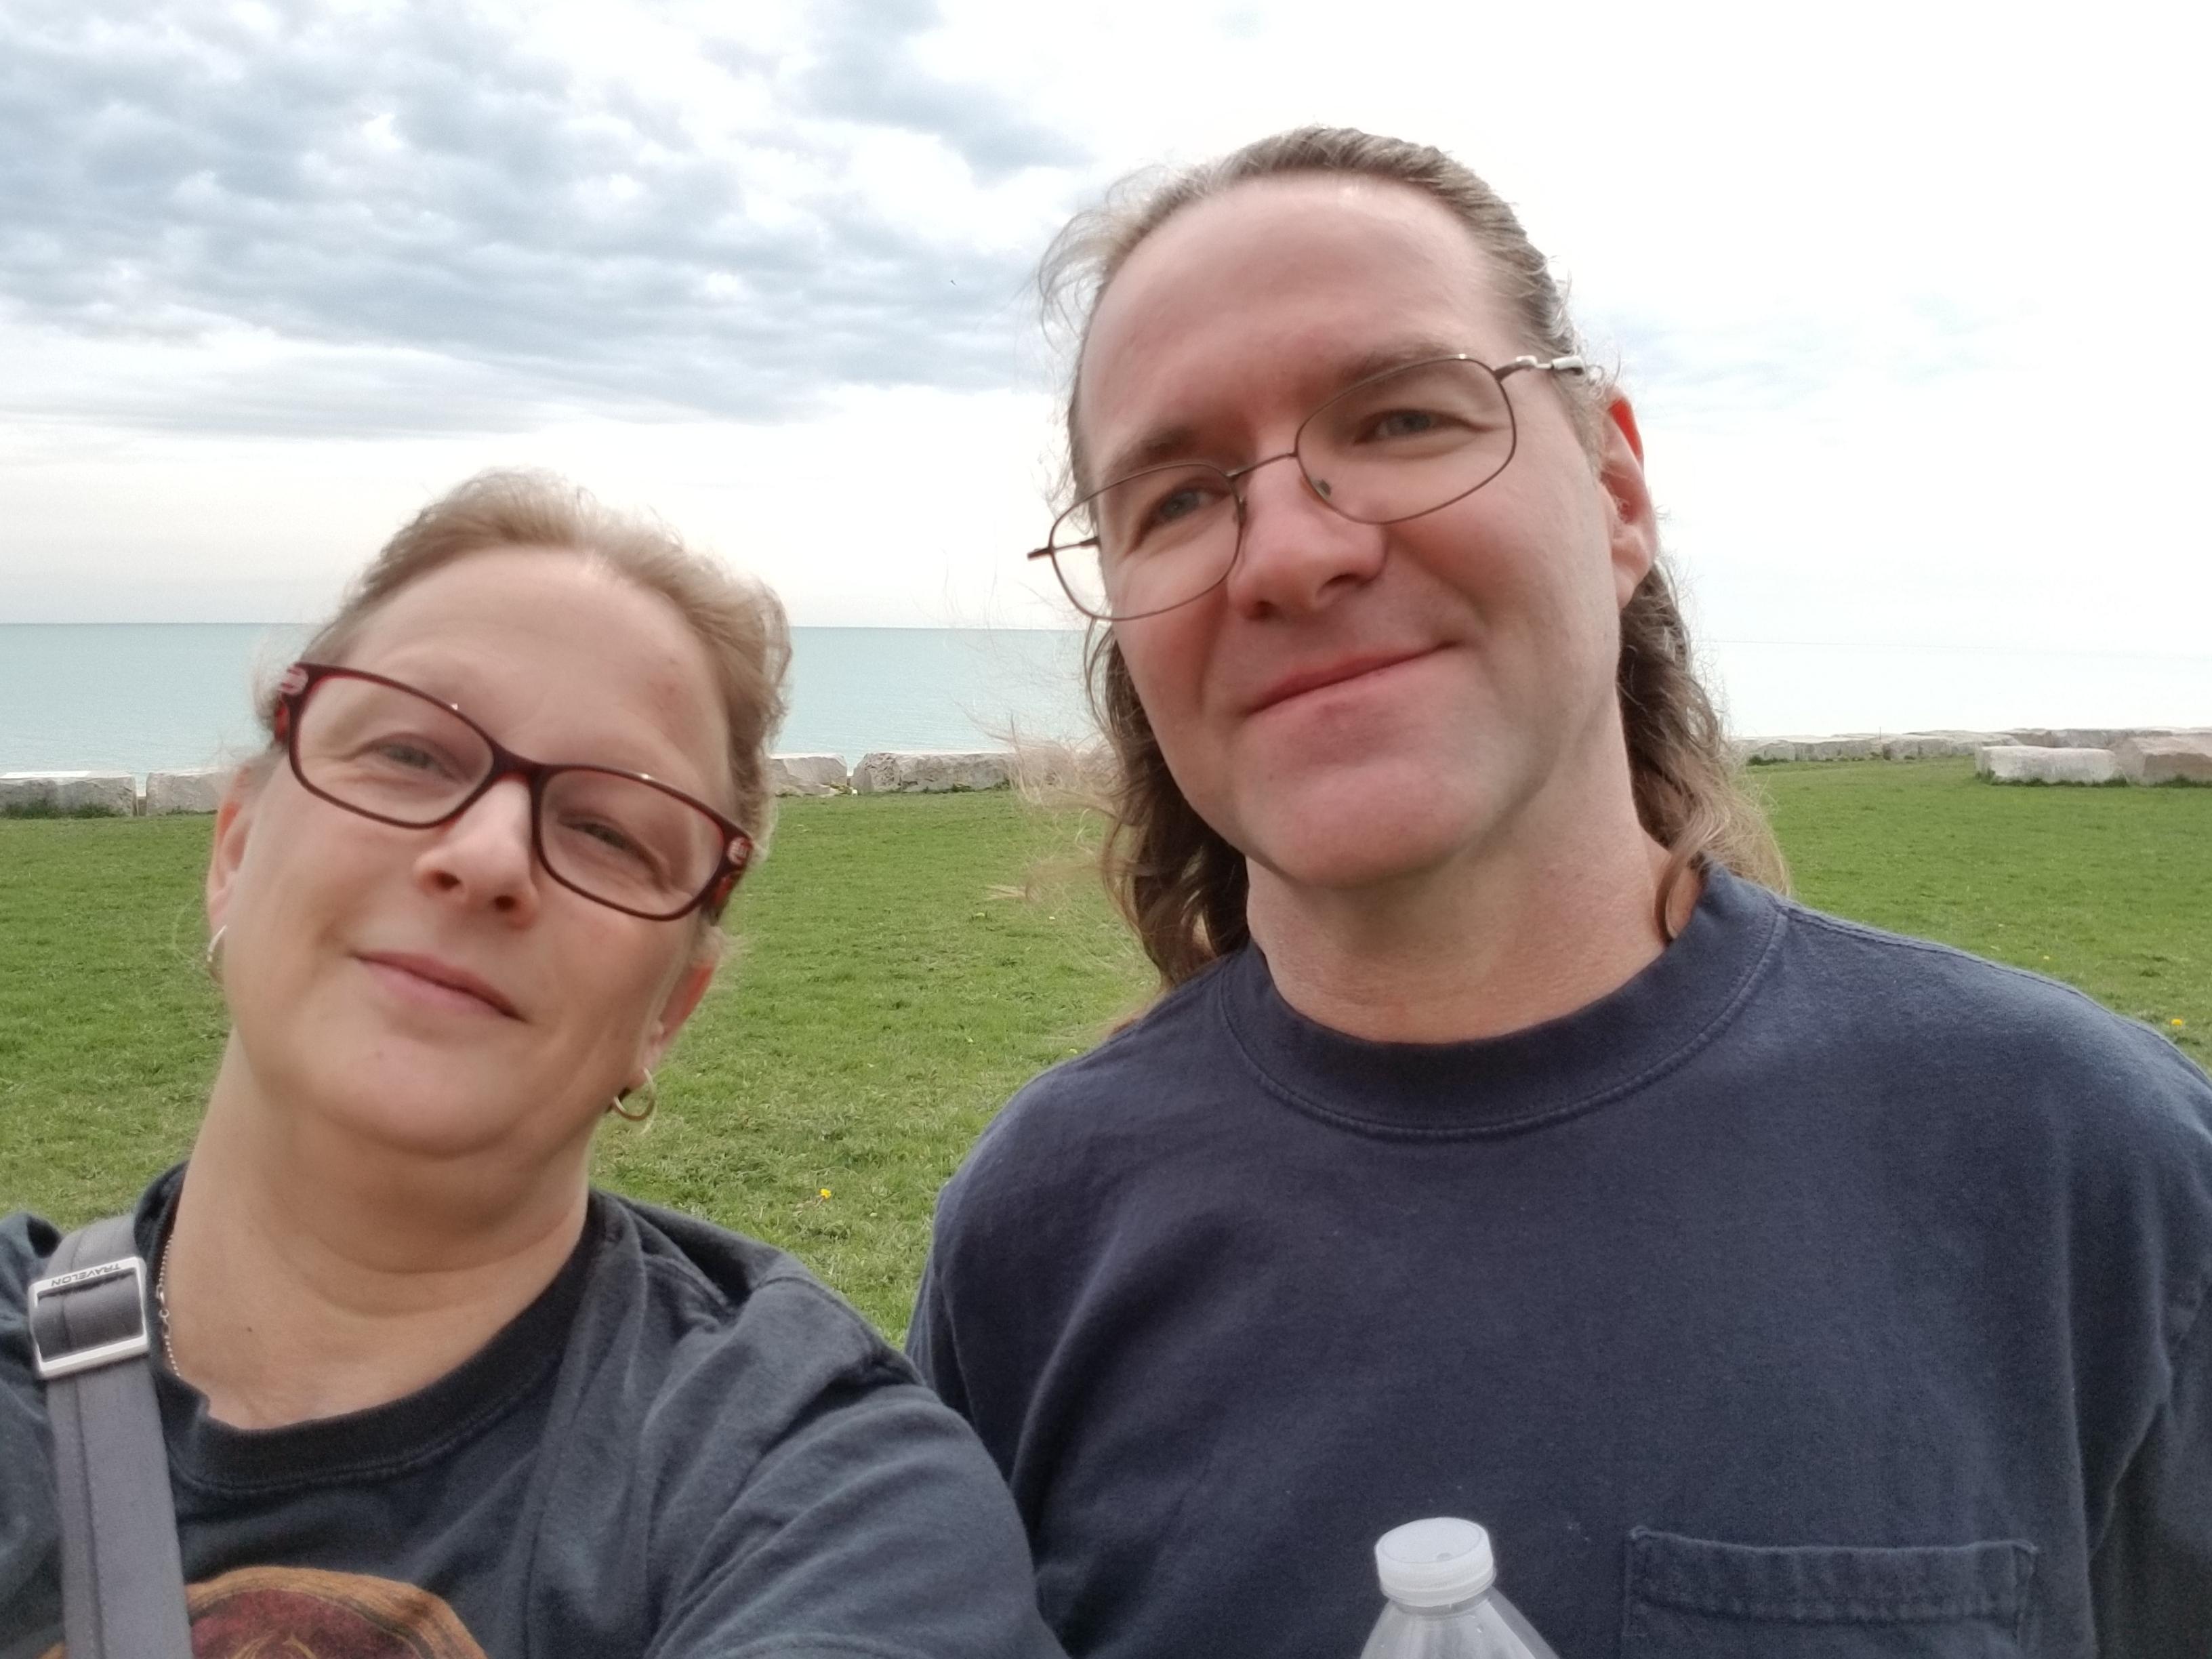 ChicagoTrip5-2018 (7)